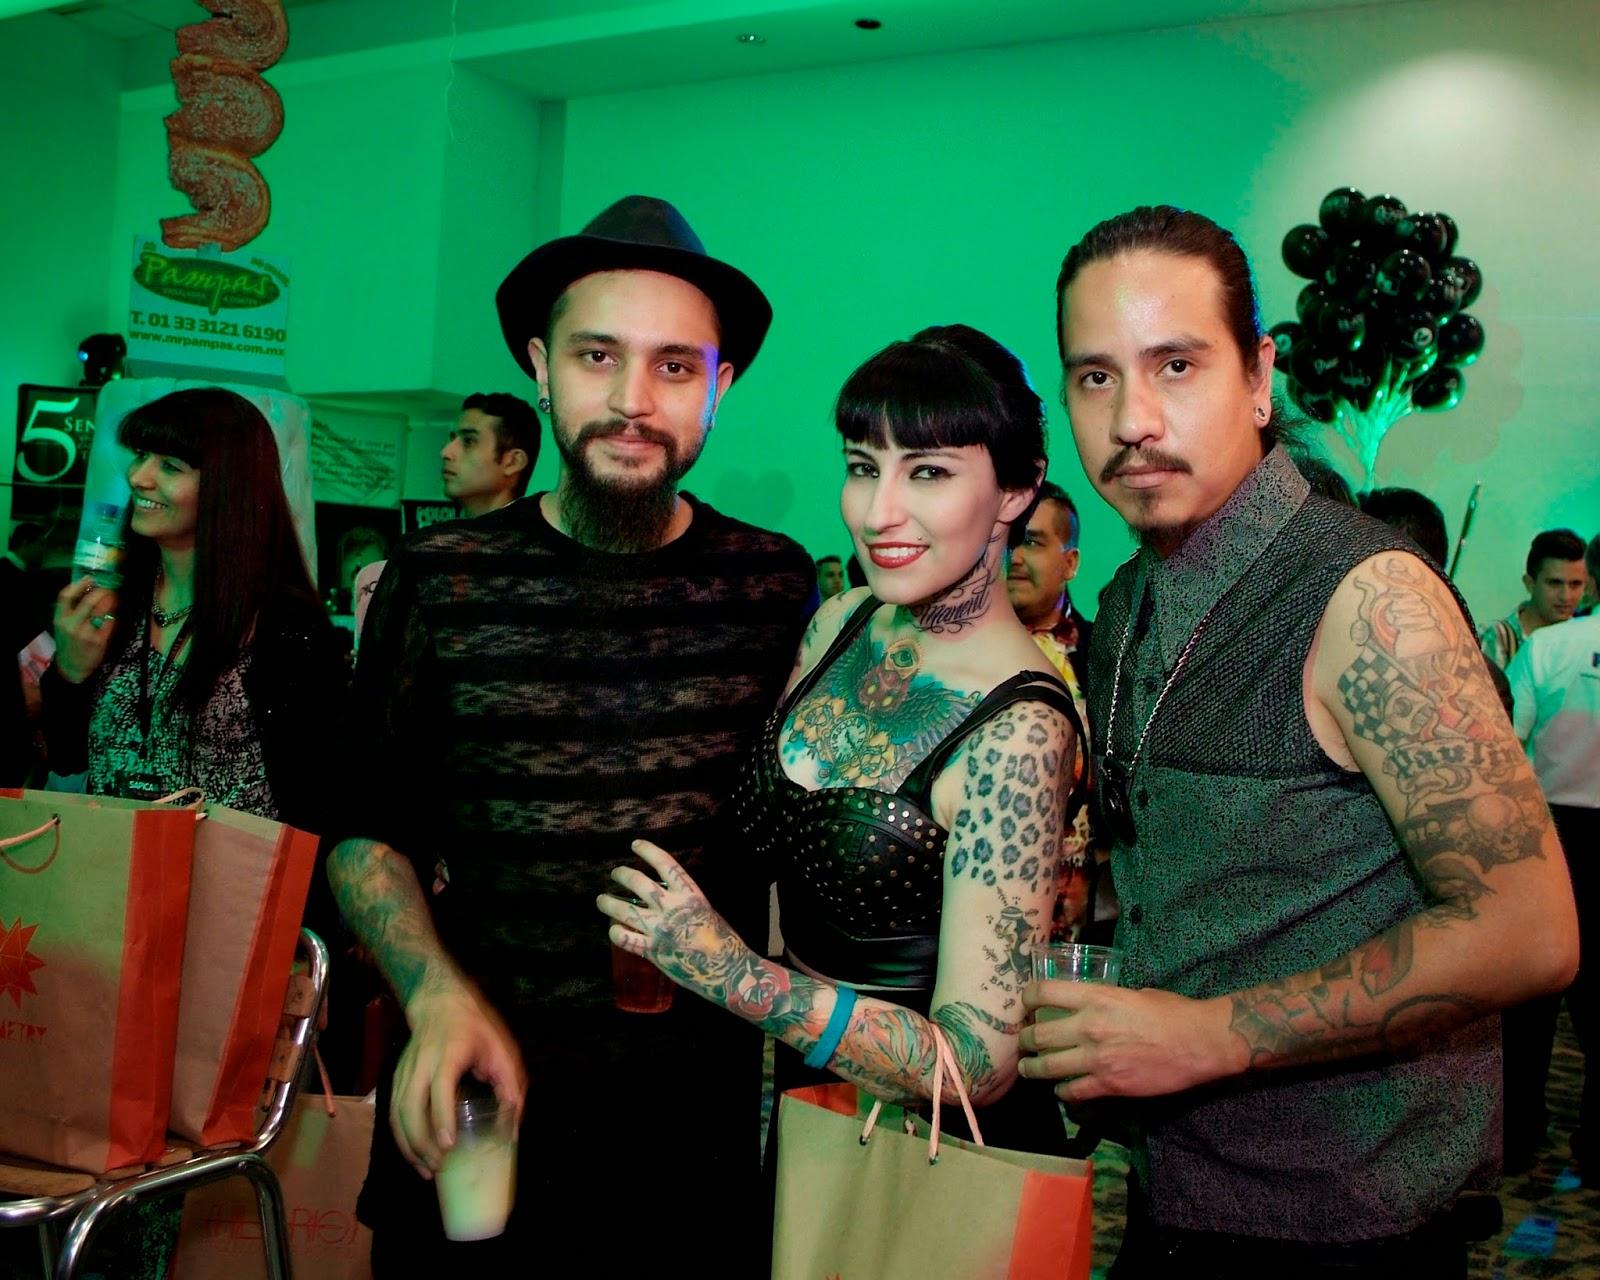 Stres, Fabian Paul, diseñadores nacionales, sapica marzo 2014, fashion avenue sapica, coctel,